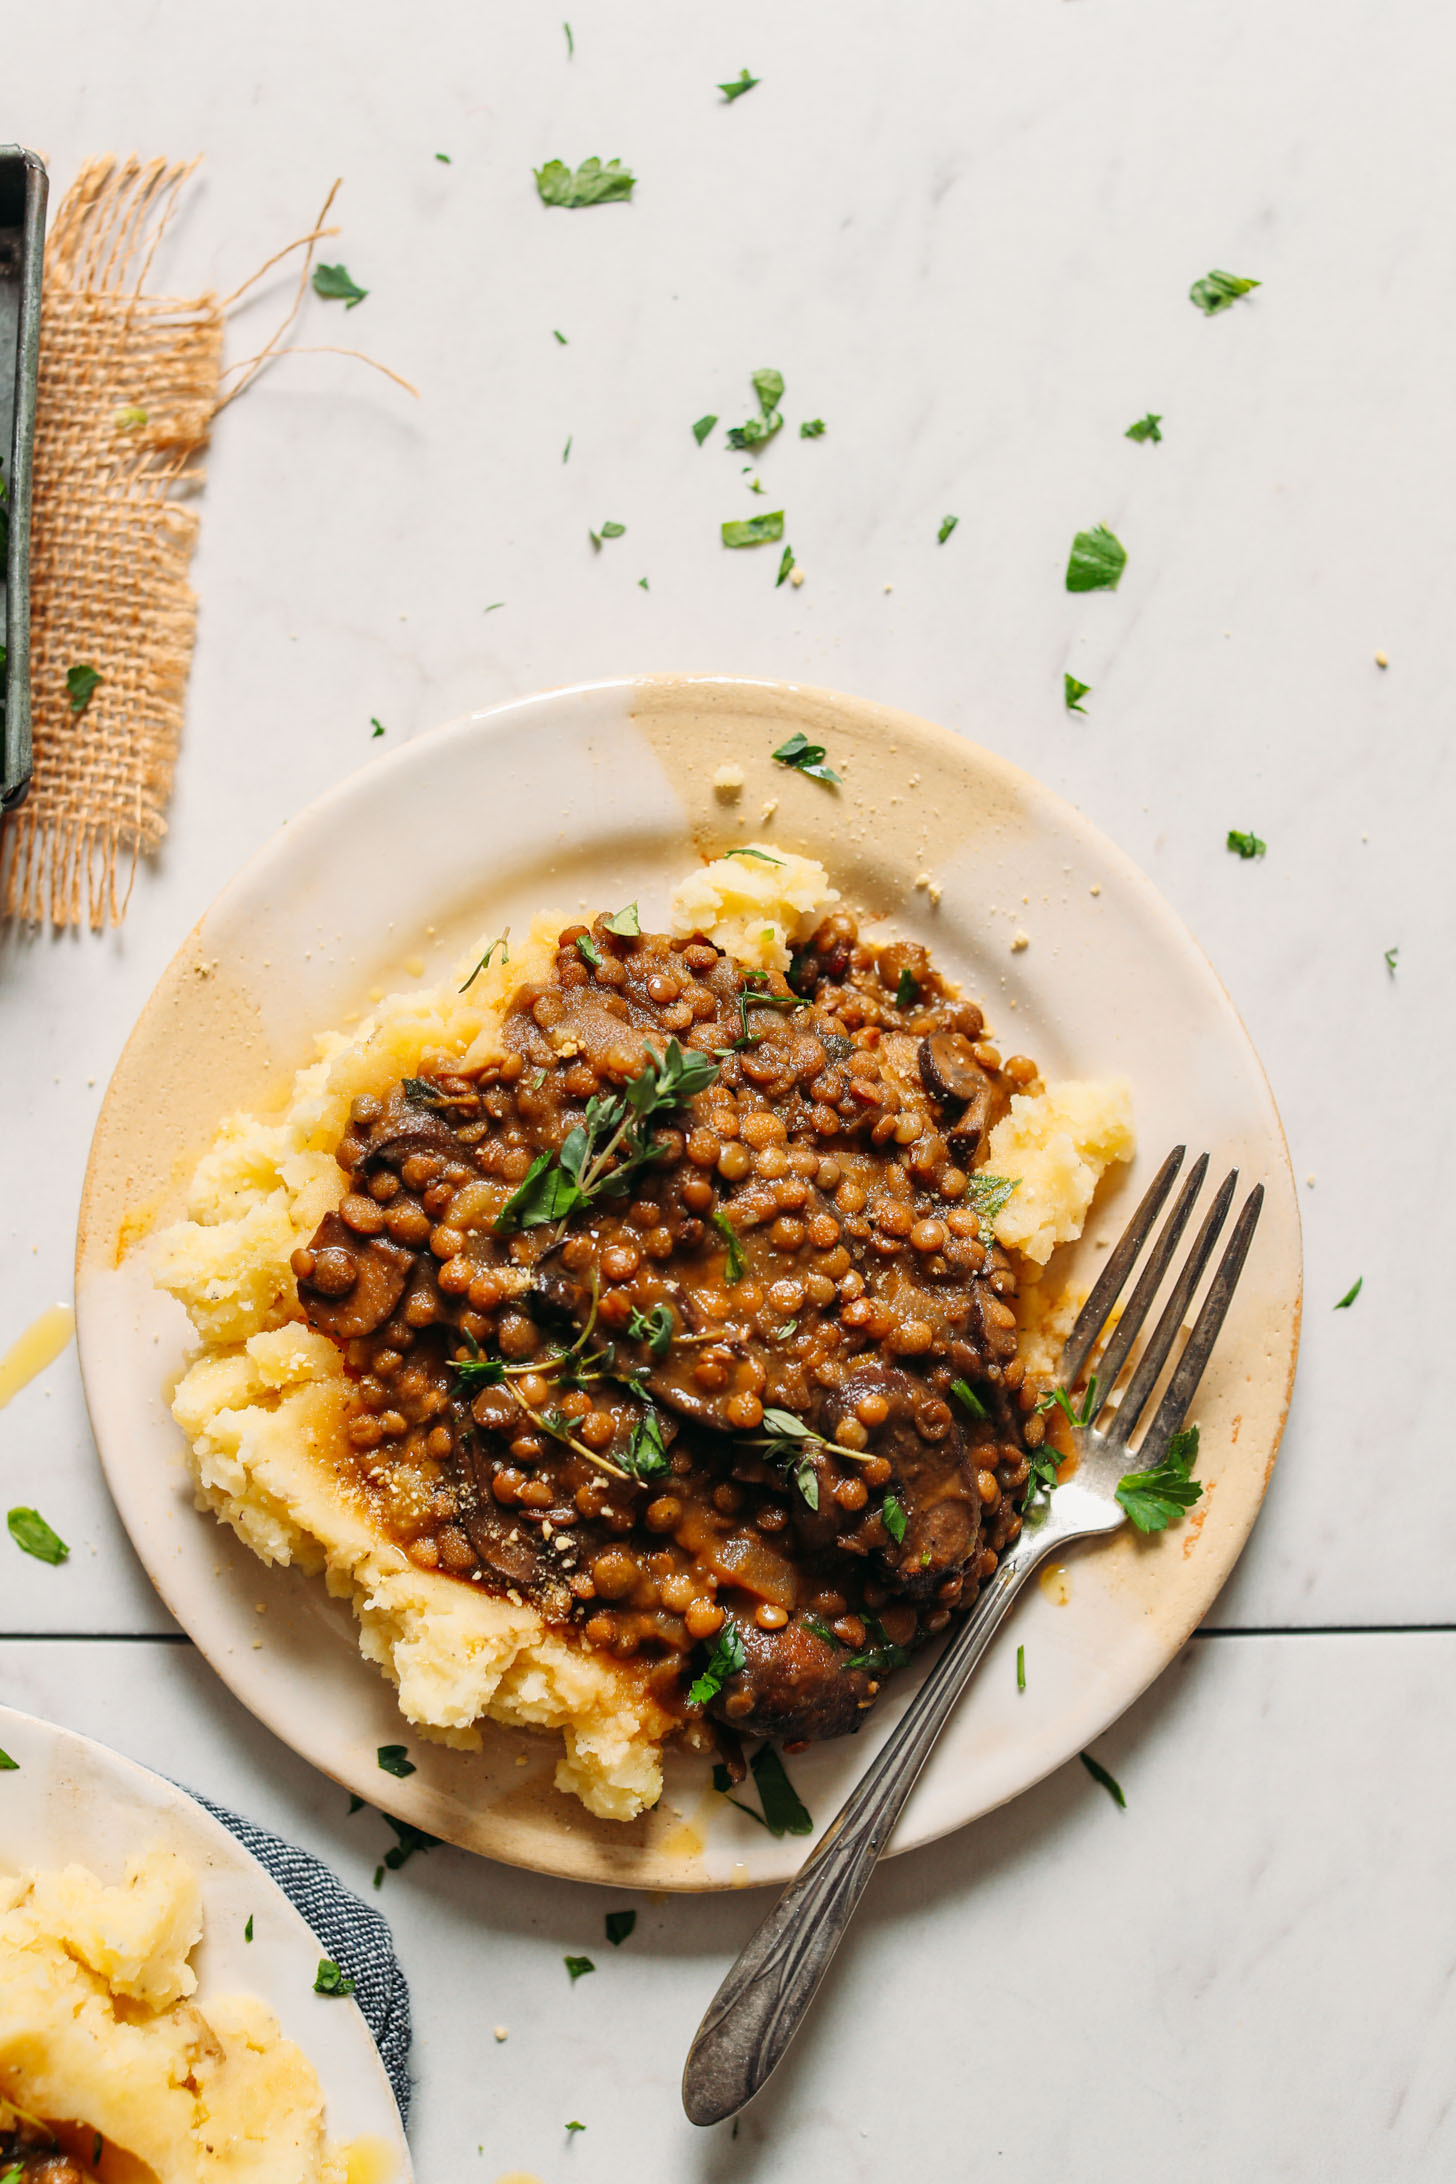 Mushroom Lentil Stew with Mashed Potatoes | Minimalist Baker Recipes